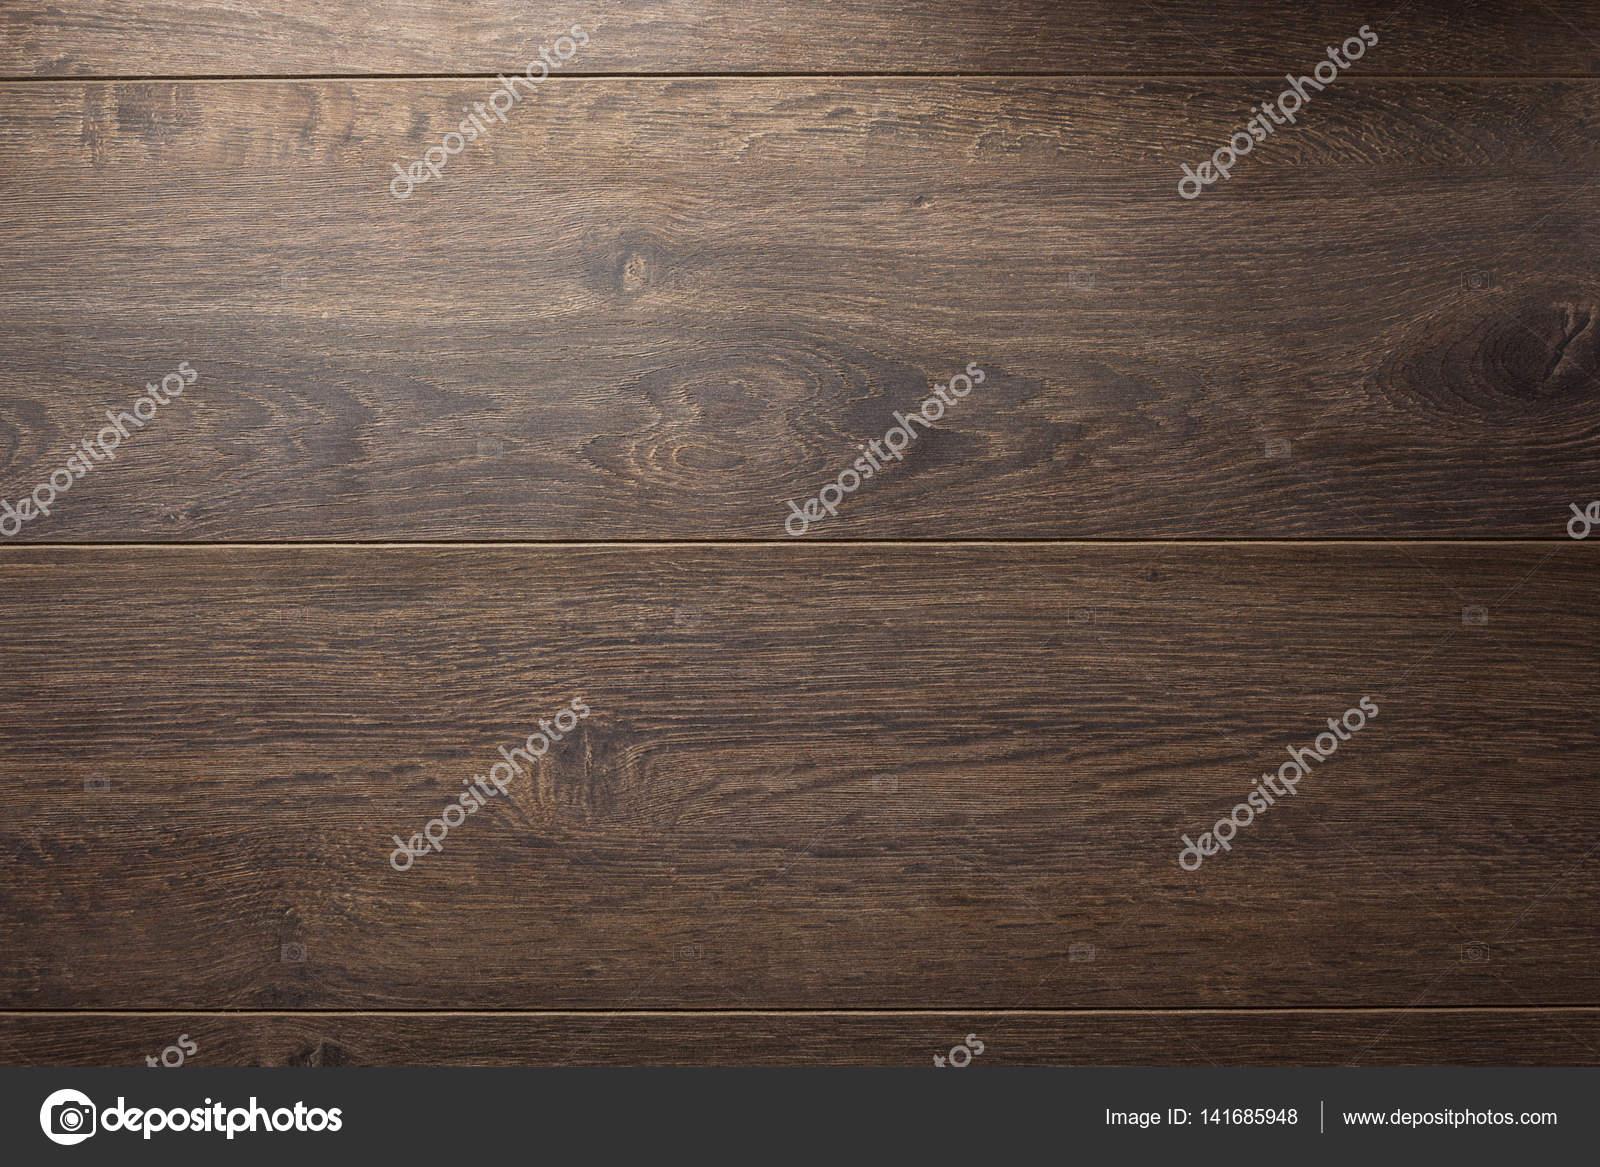 laminat-fußboden aus holz hintergrund — stockfoto © seregam #141685948